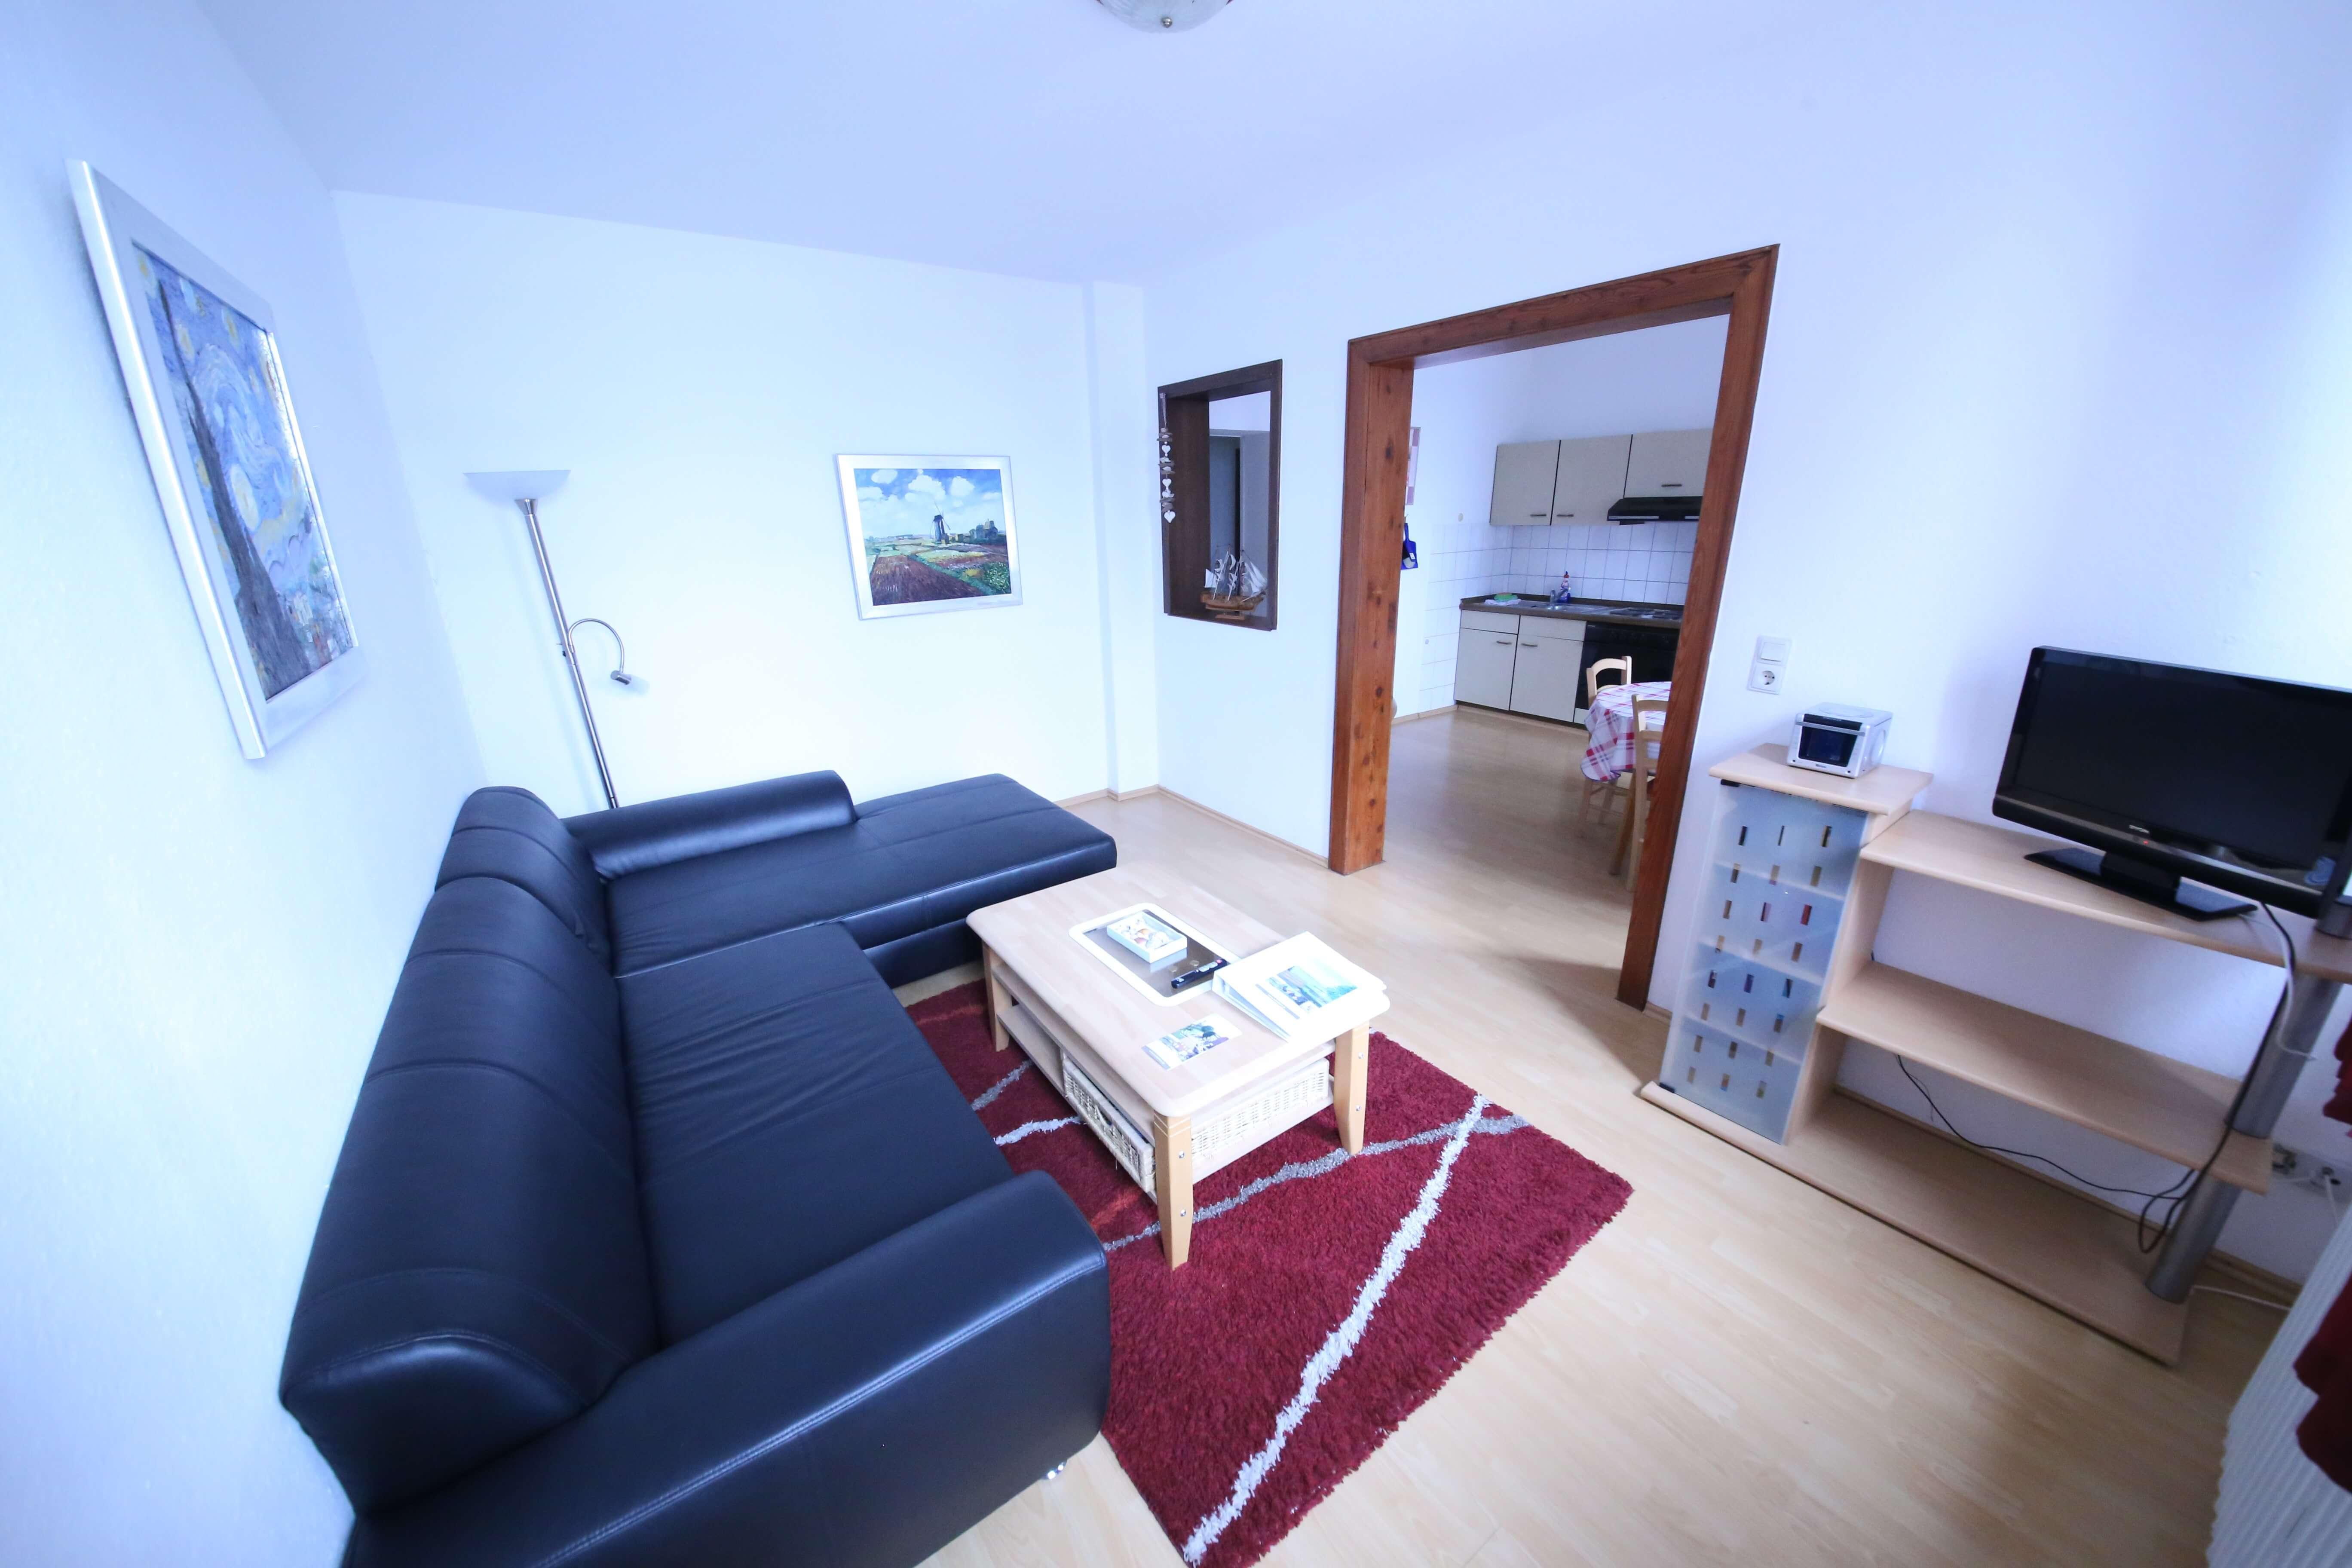 Apartment 10 6 personen apartmenthaus schleiblick for Kochen 10 personen